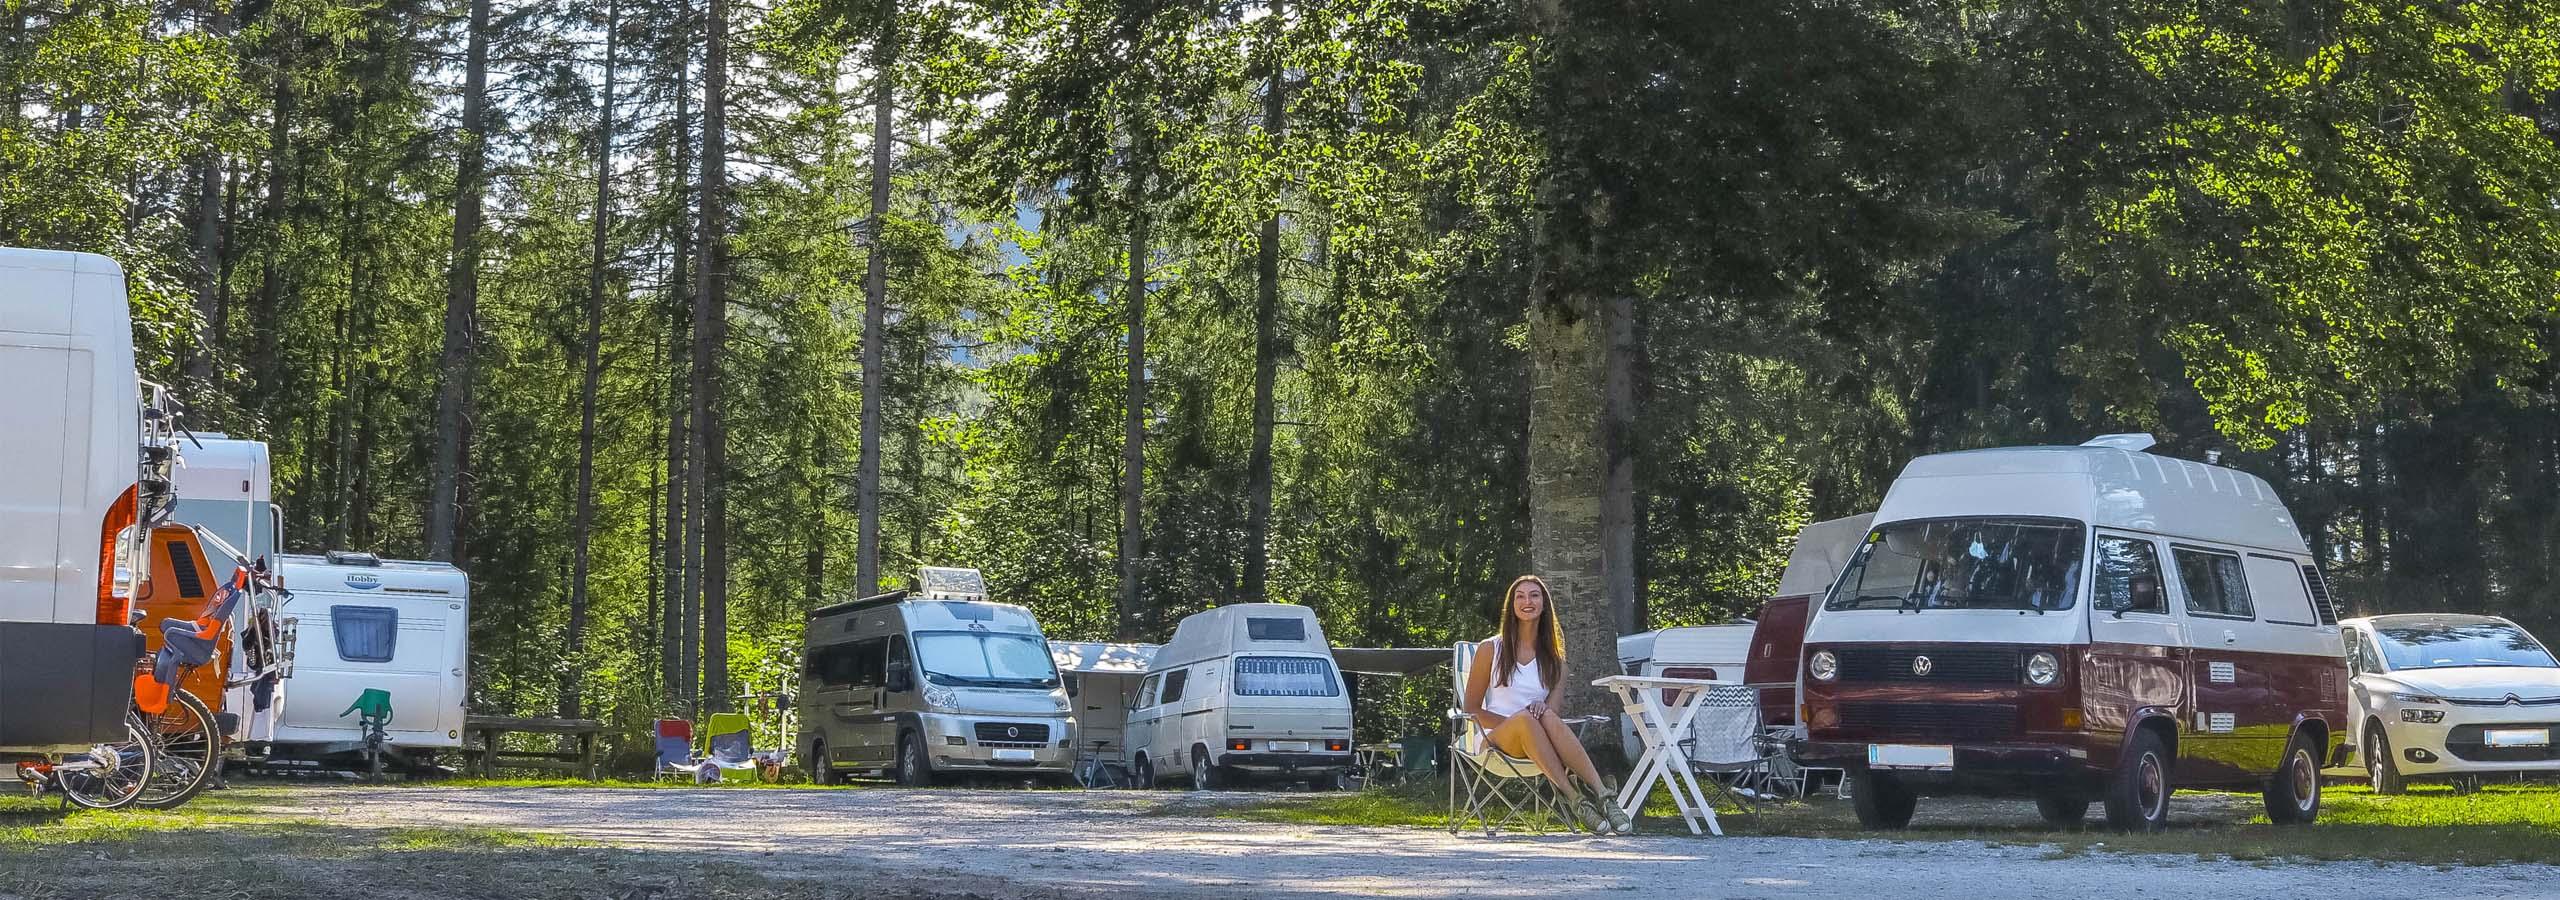 https://www.kempy-chaty.cz/sites/default/files/turistika/camping_erlaufsee_karavany_stany.jpg